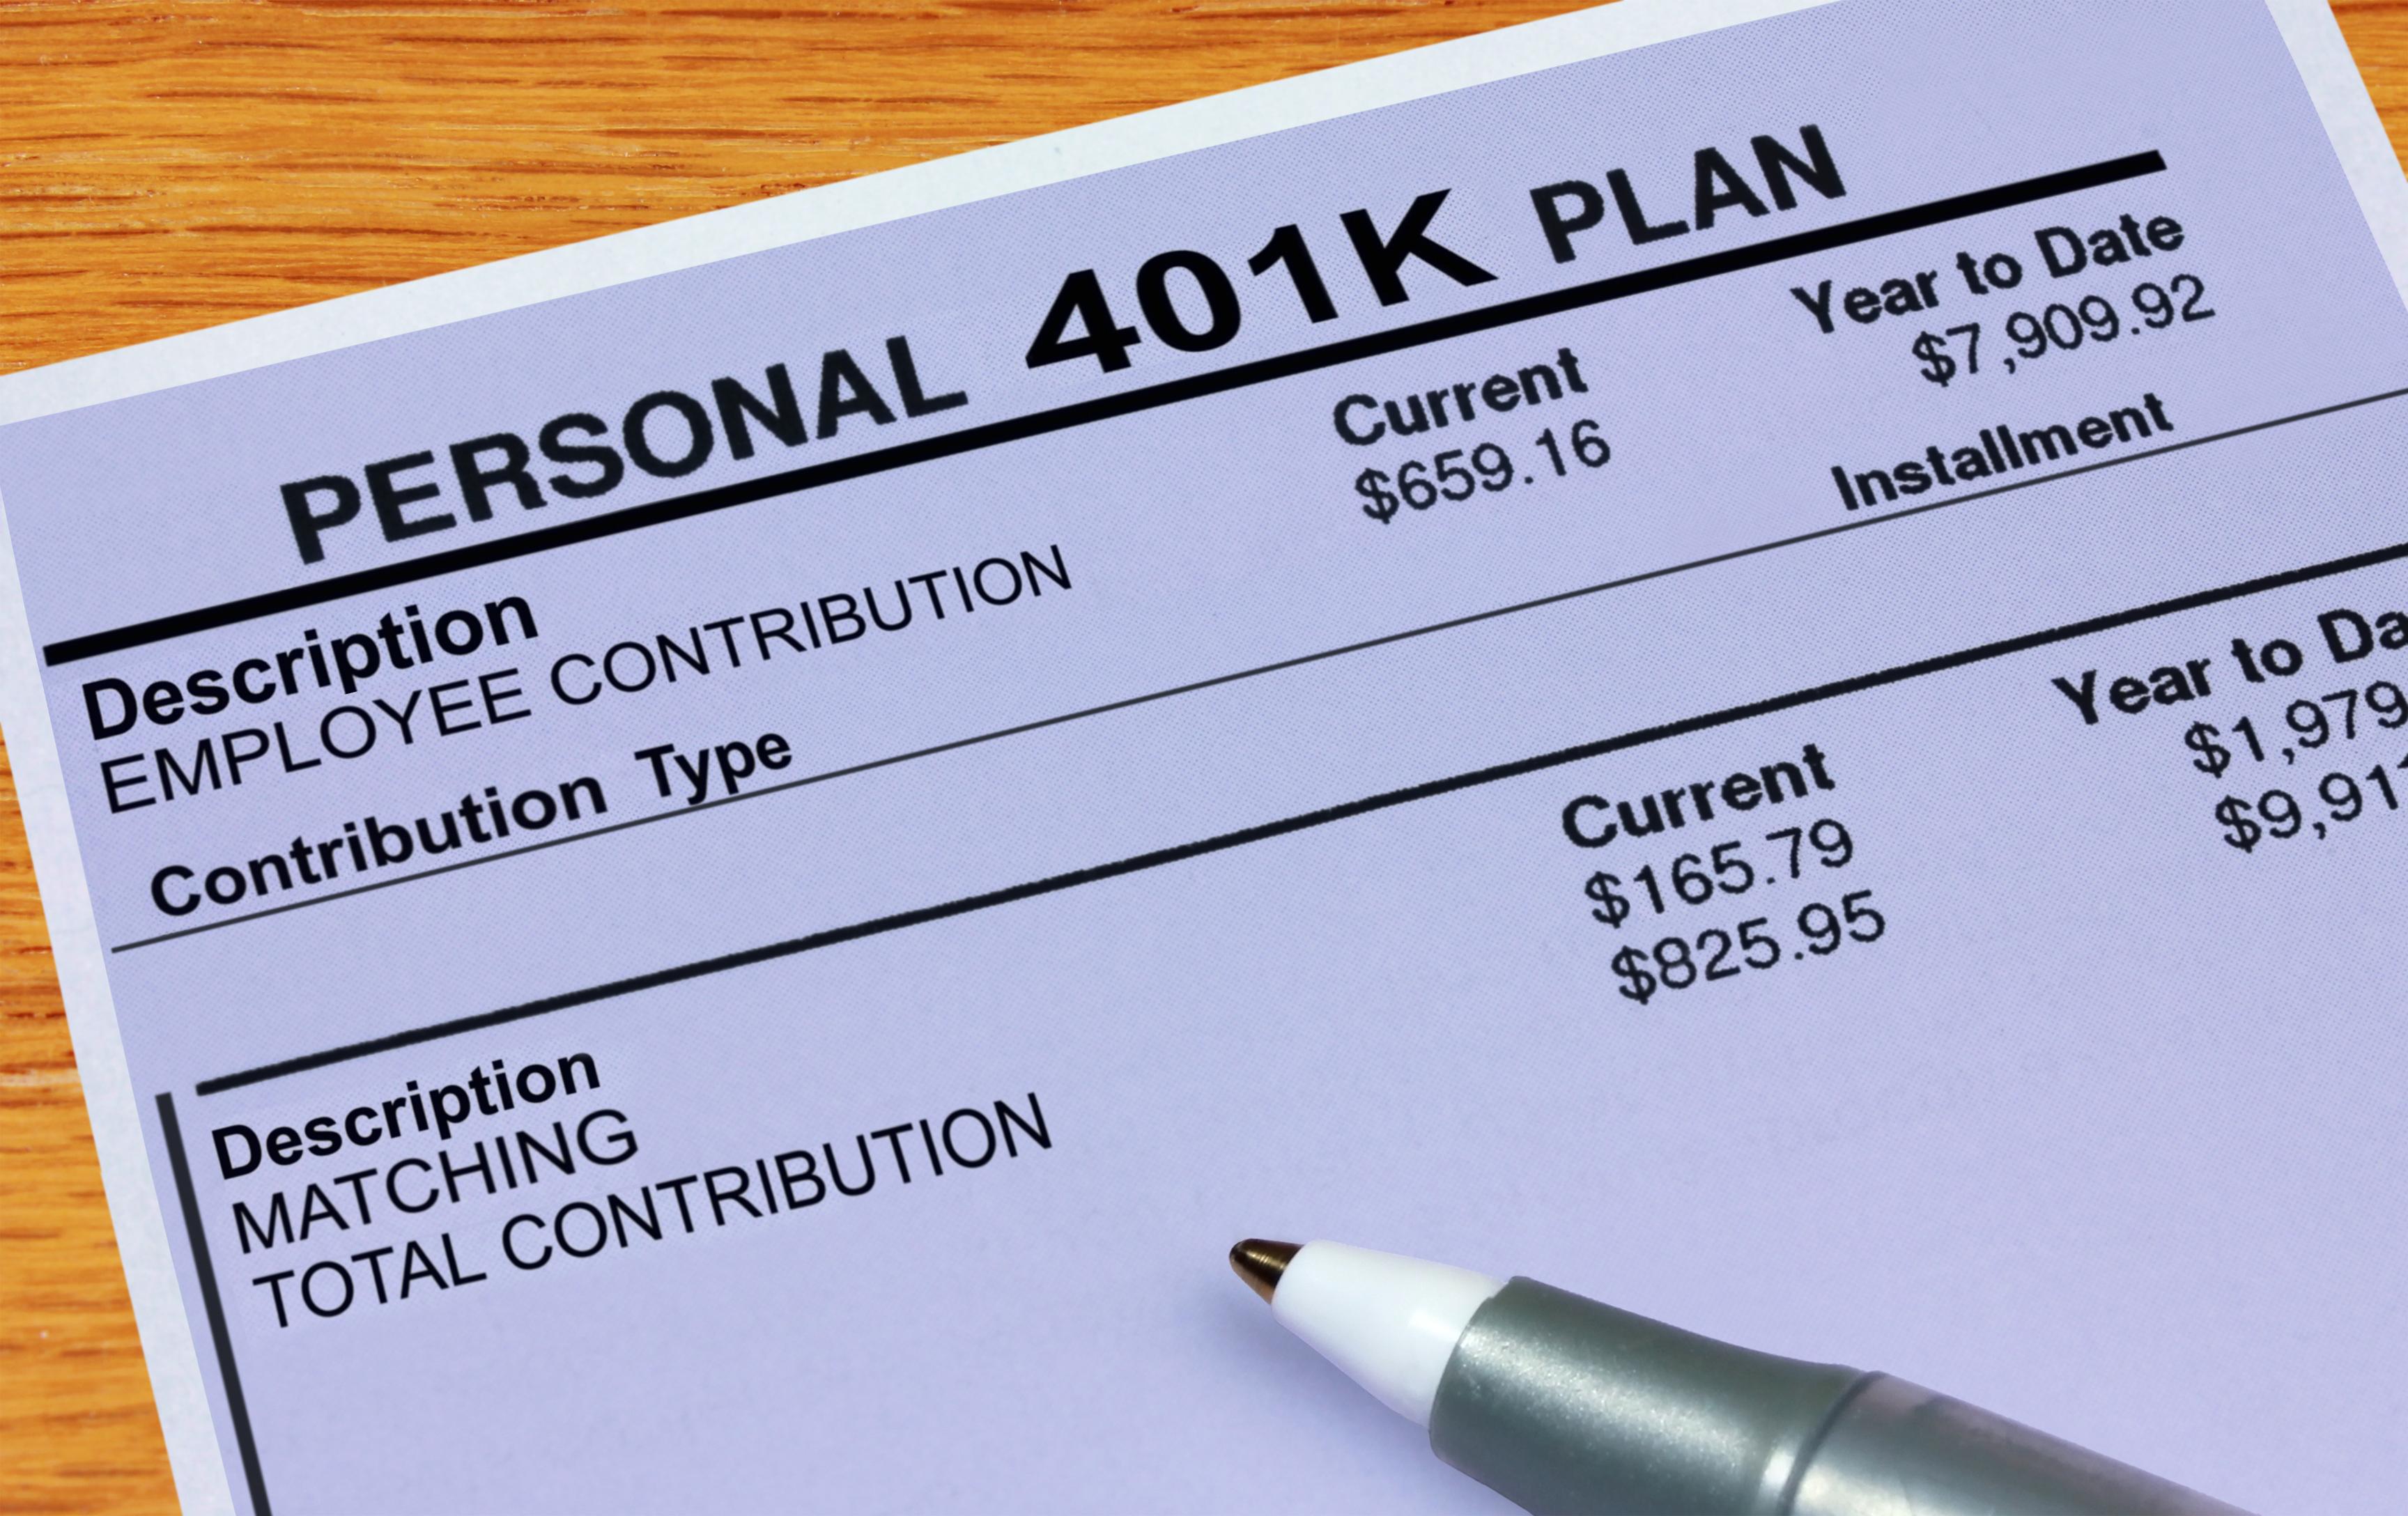 401(k) statement showing employer matching contribution